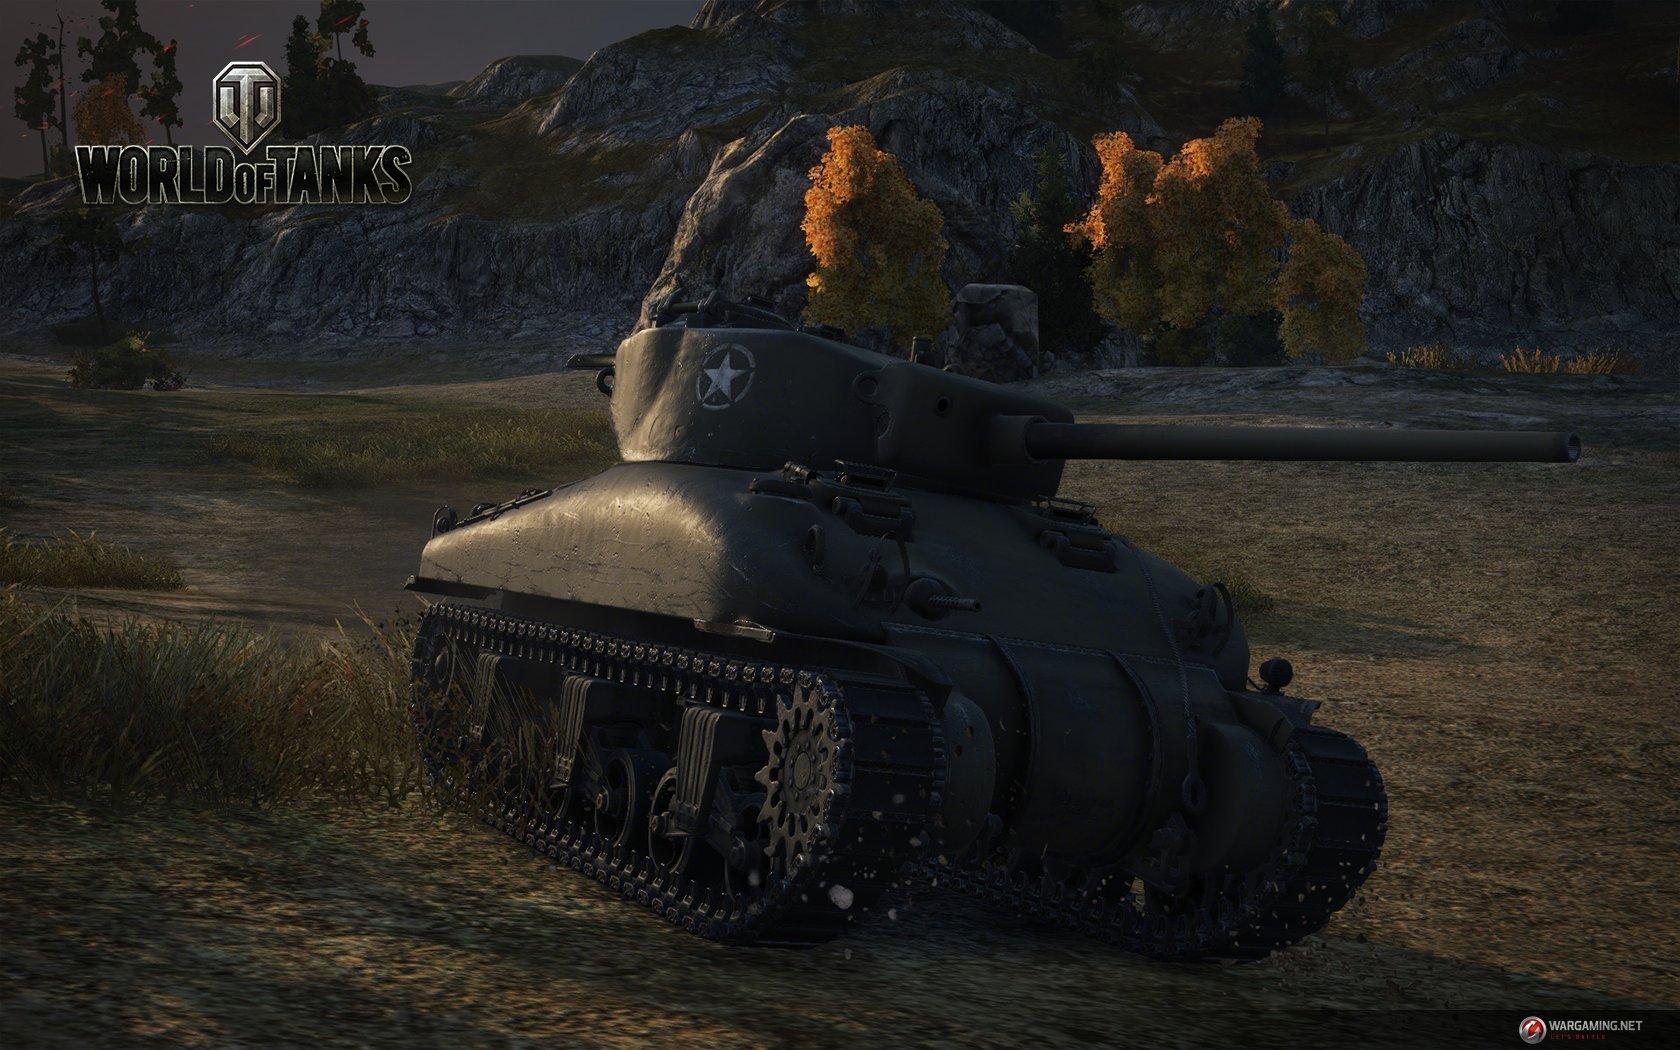 World of Tanks Update 9.0: M4 Sherman